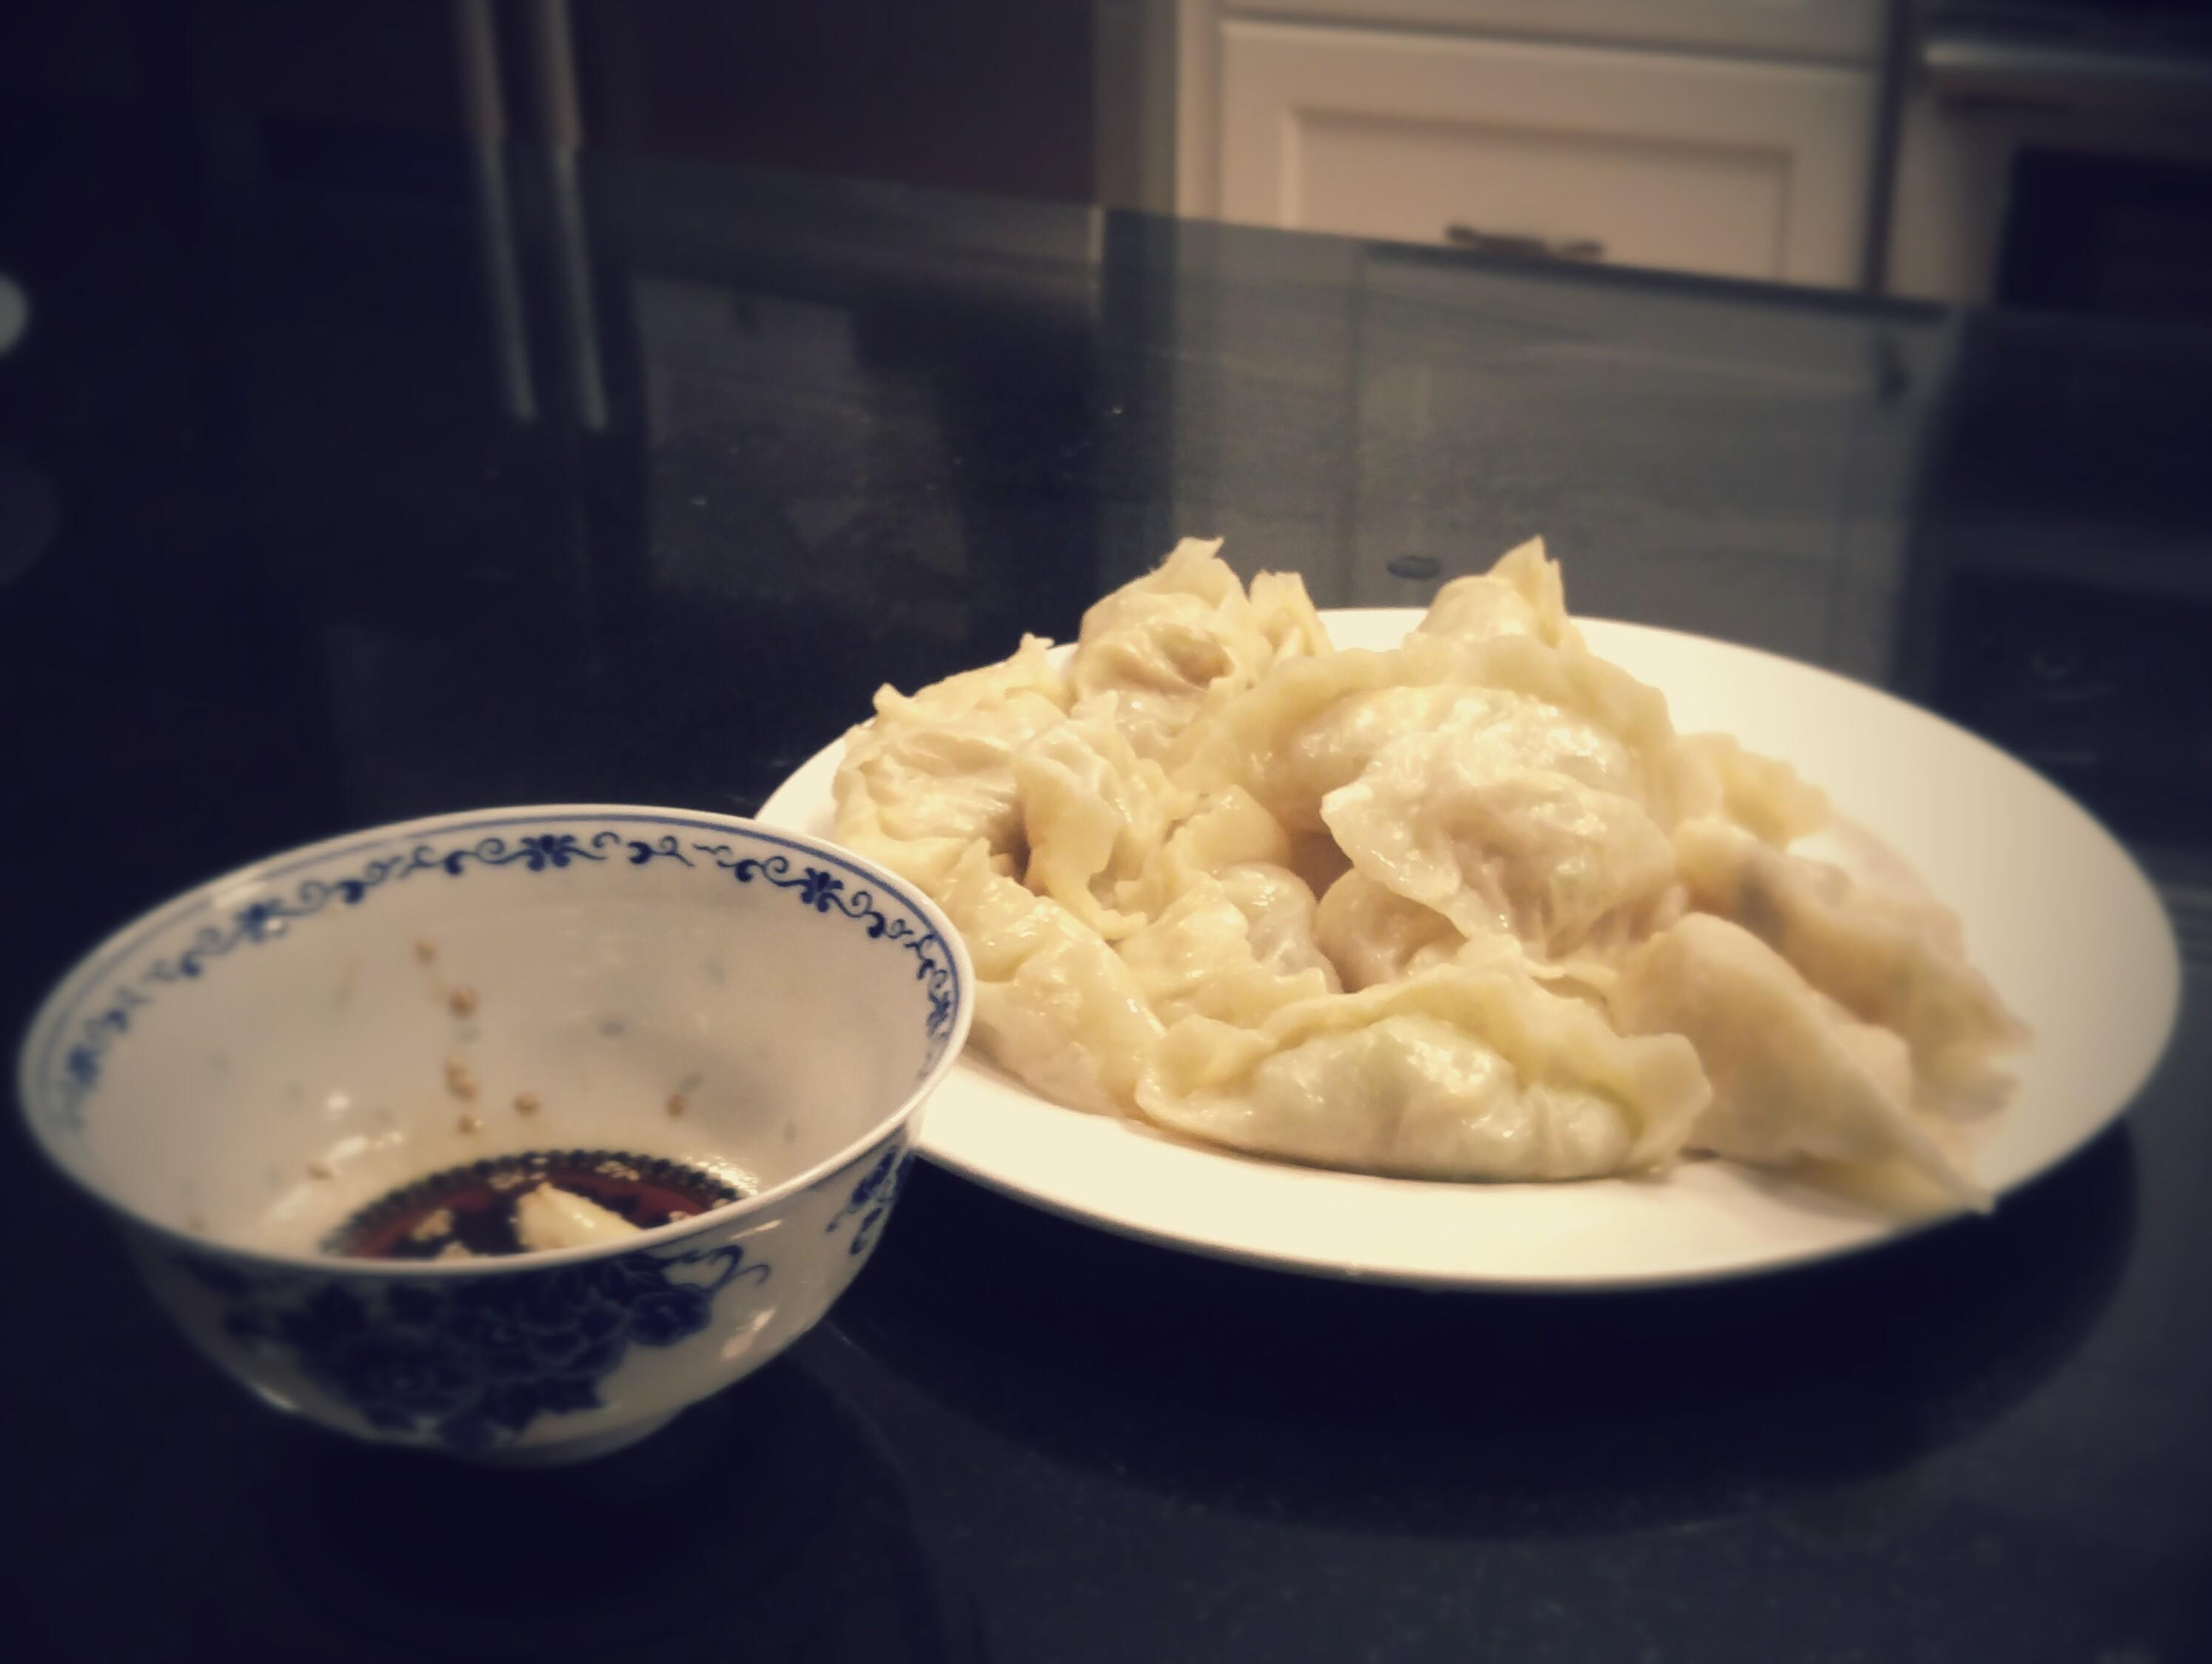 dumpling finished